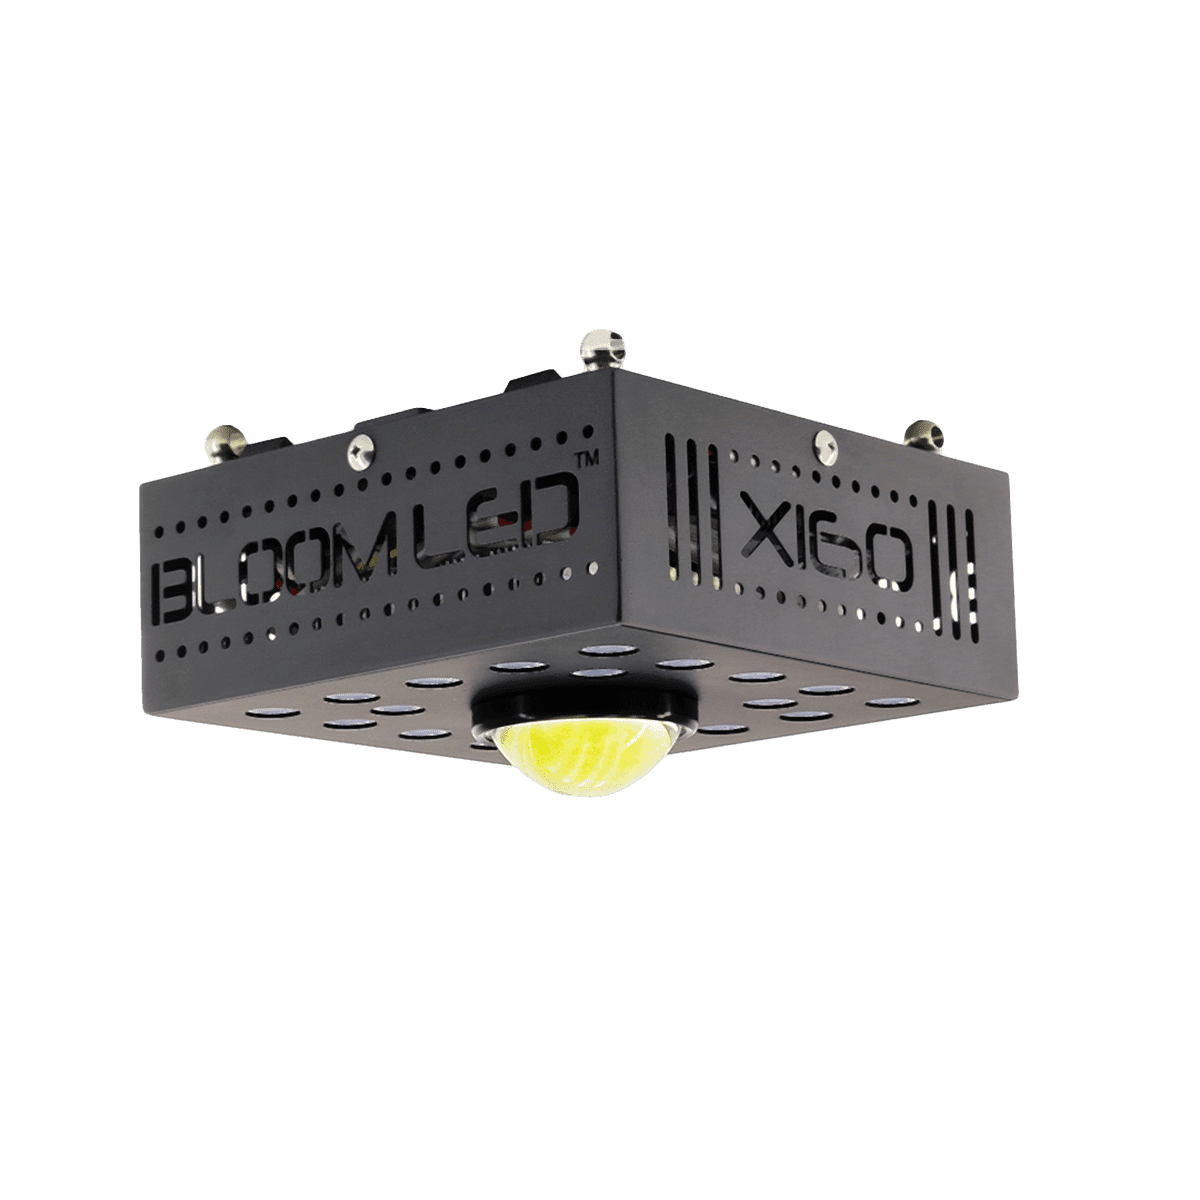 SPECTRAPANEL-X160-4